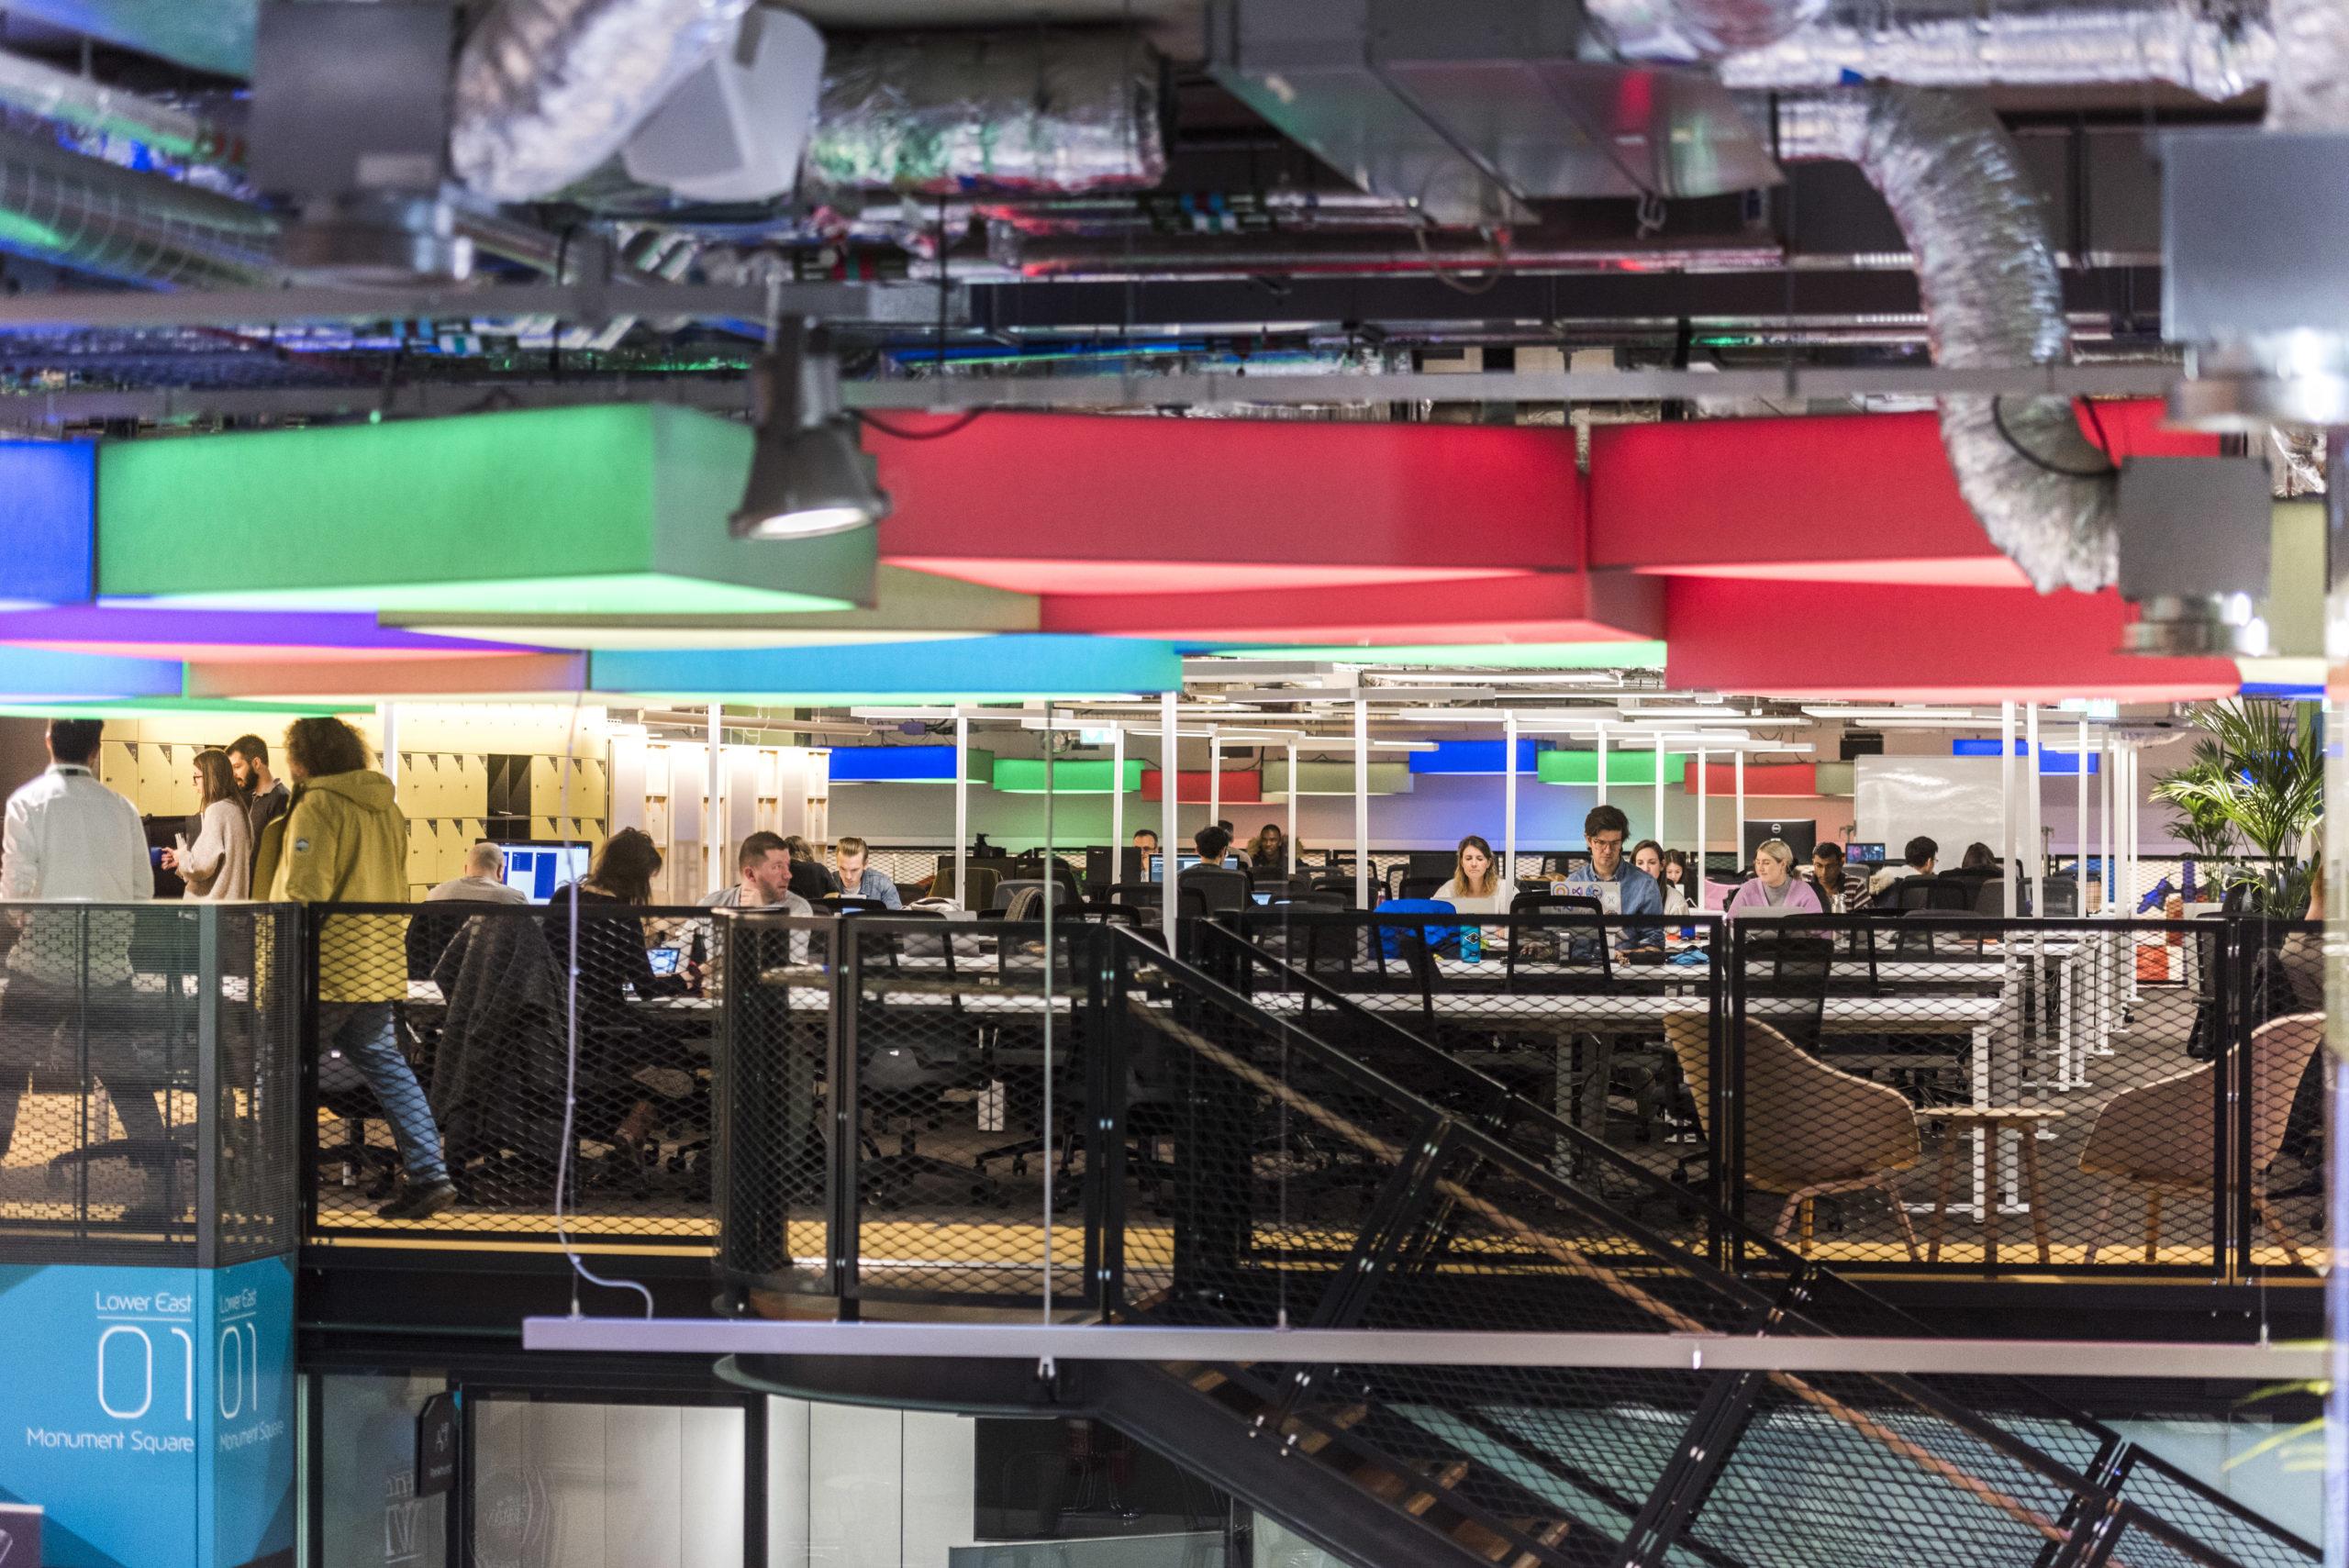 The Plexal workspace in east Londo